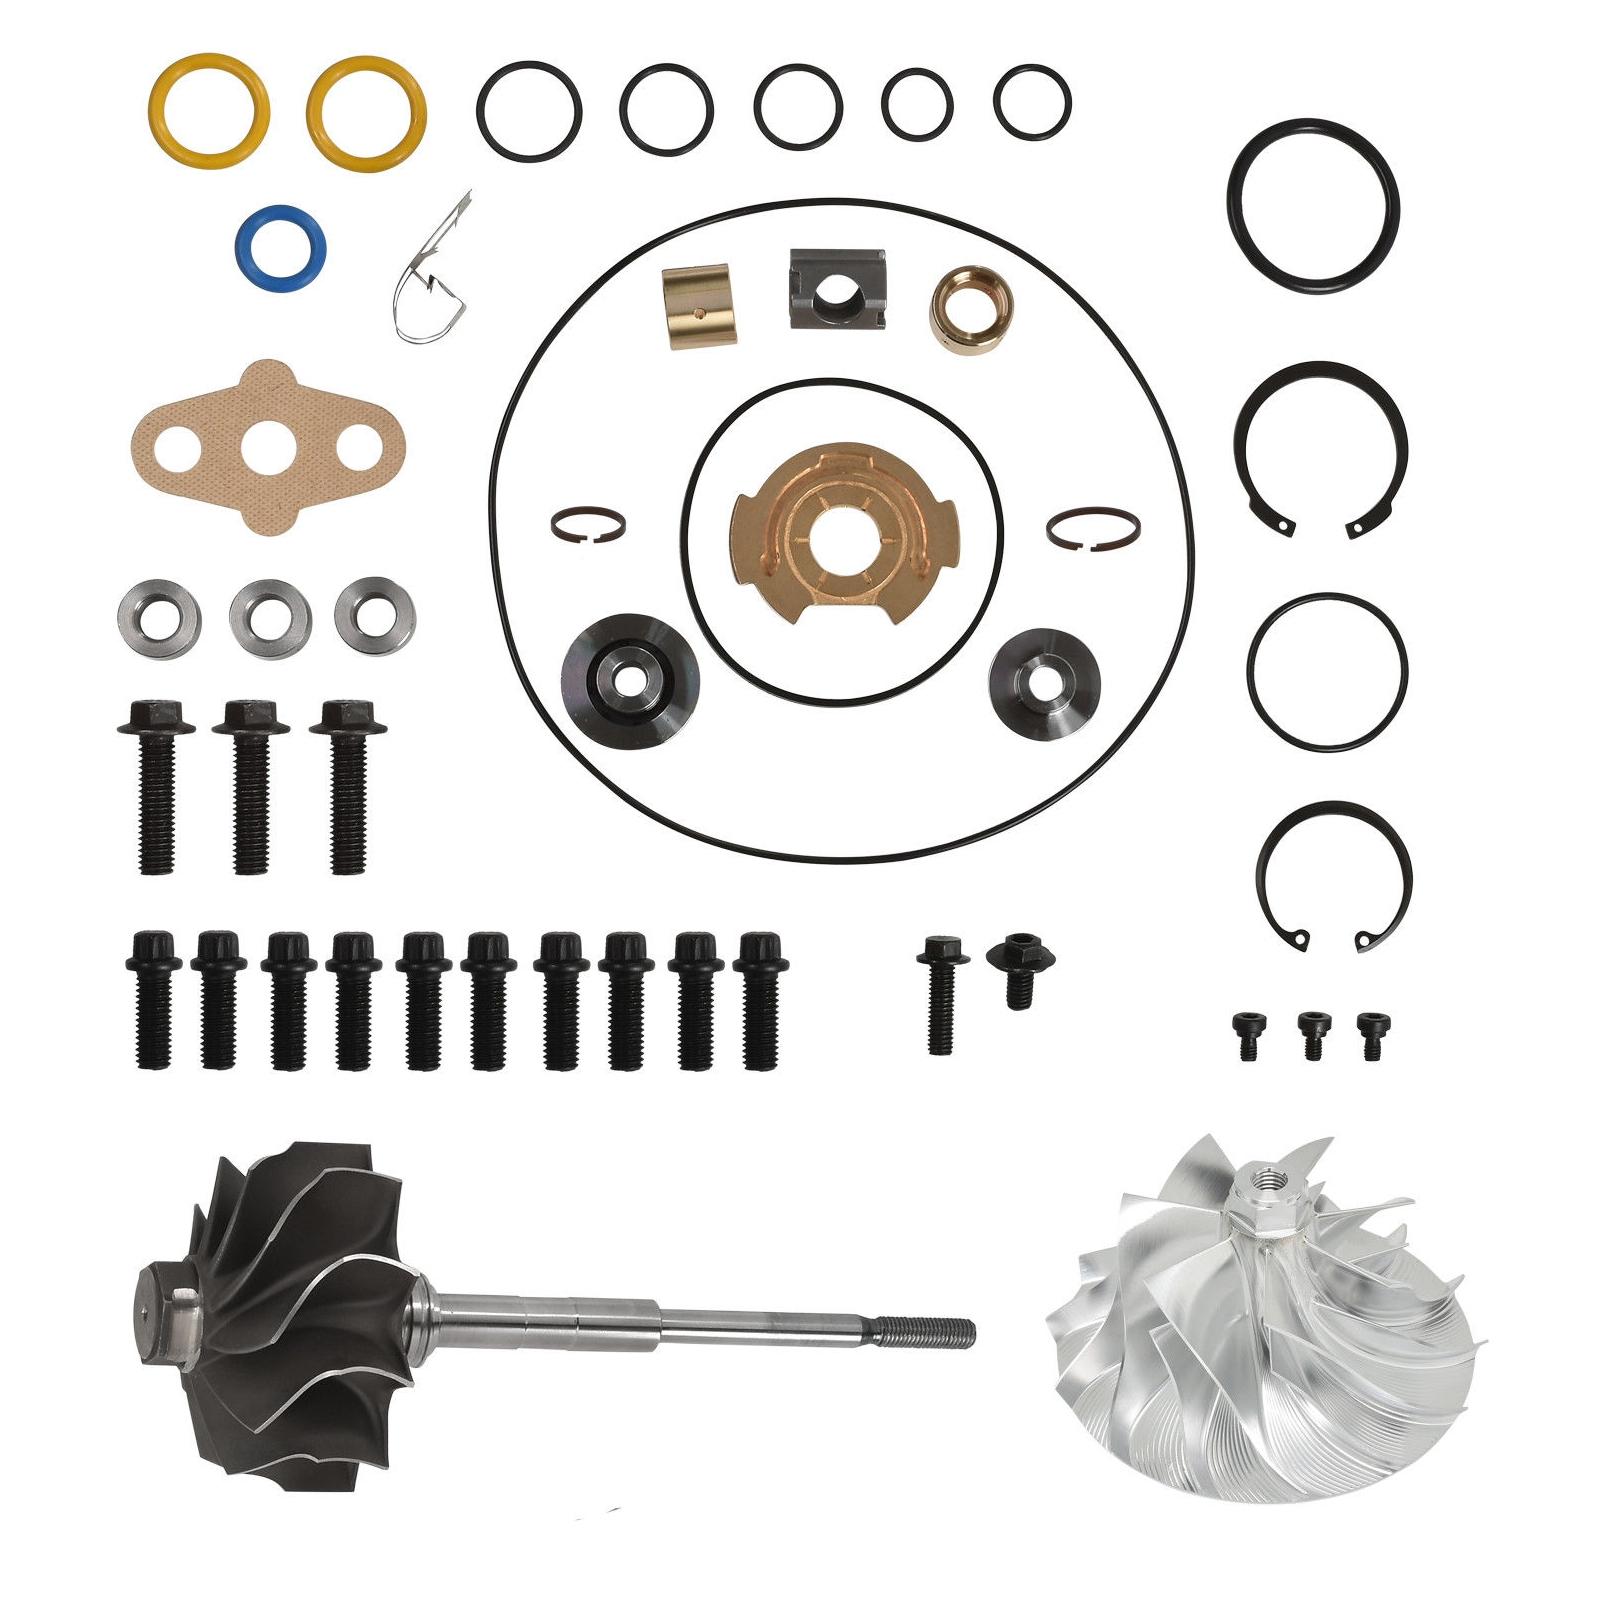 GT3782VA Turbo Rebuild Kit Billet Compressor Wheel Turbine Shaft For 03-Early 04 6.0L Ford Powerstroke Diesel